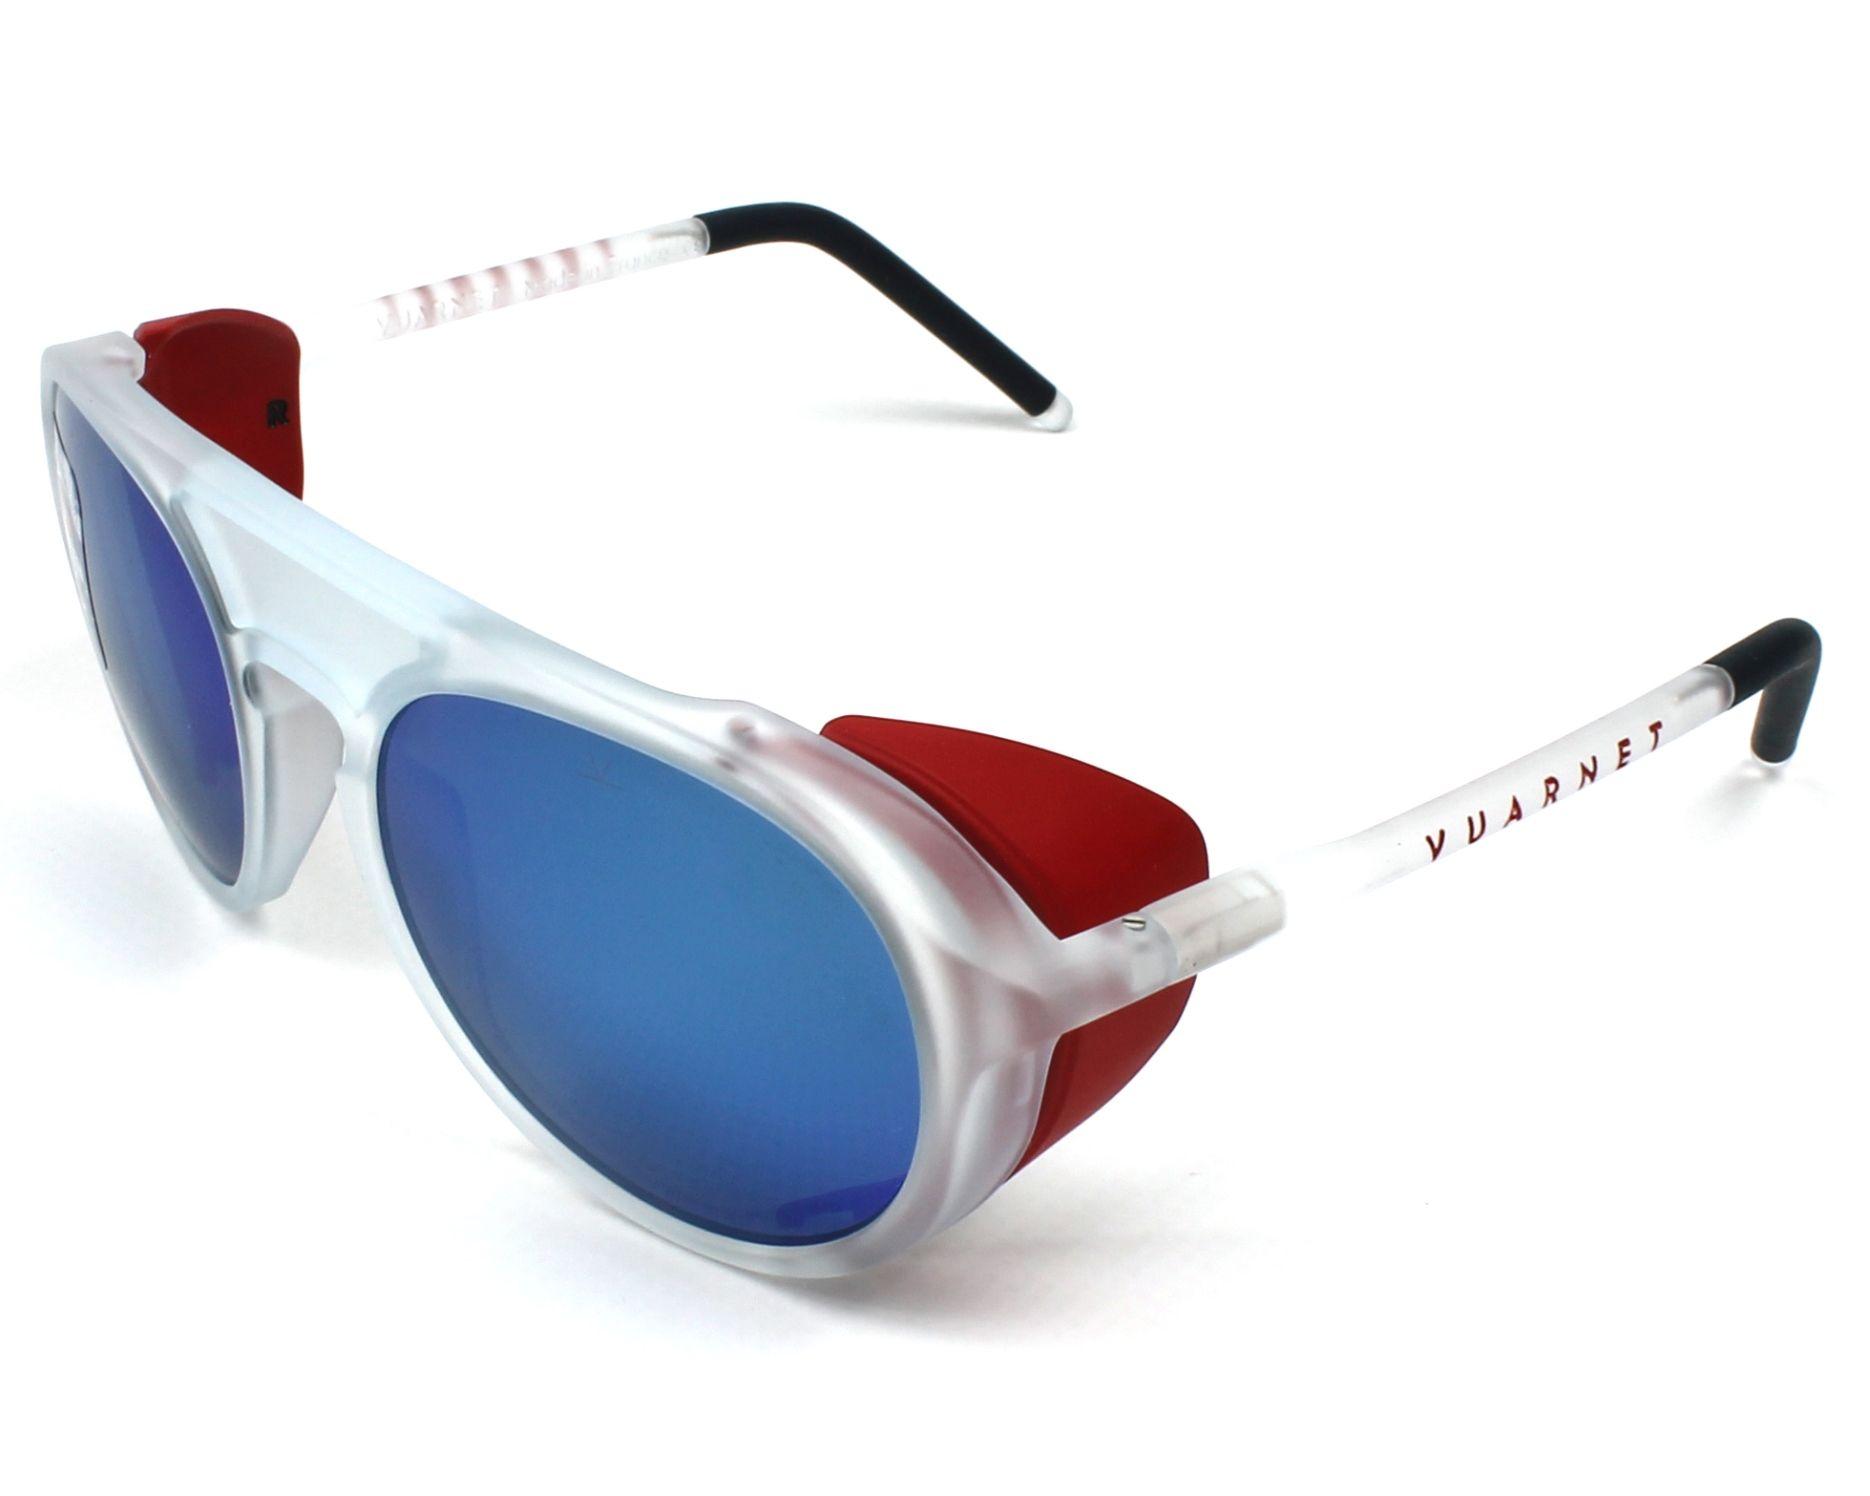 53f1dc28bf0c2 Sunglasses Vuarnet VL-1709 0008-1626 51-18 Crystal profile view